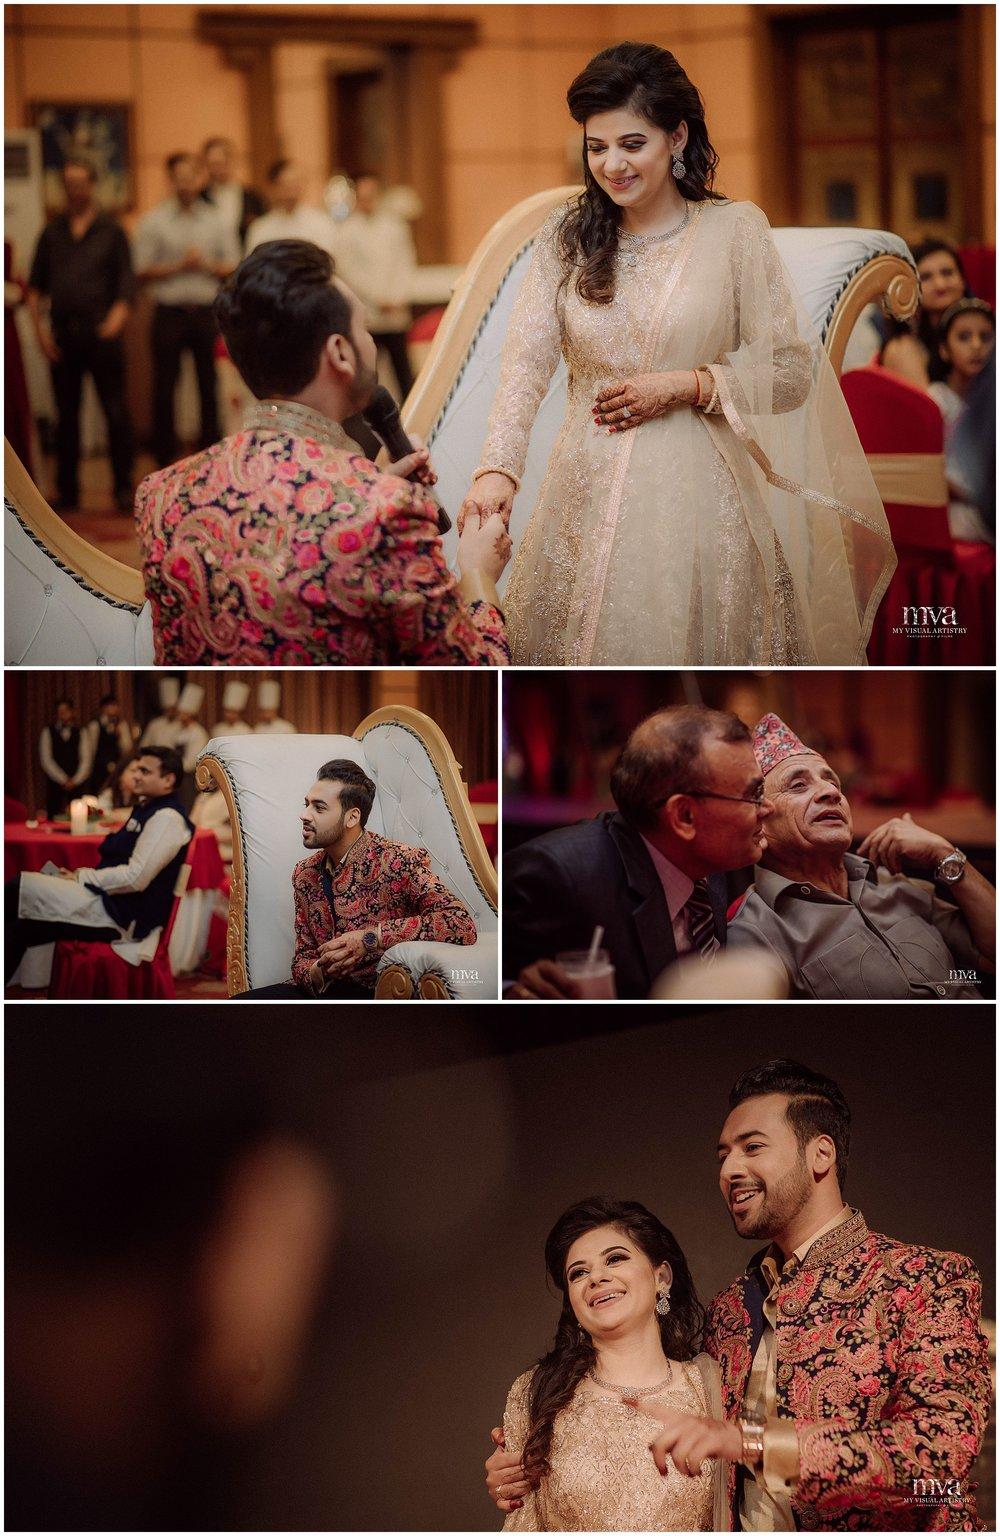 SONAAL_AMI_MYVISUALARTISTRY_WEDDING_PHOTOGRAPHY_MVA_NEPAL_KATHMANDU_SOALTEE14.jpg